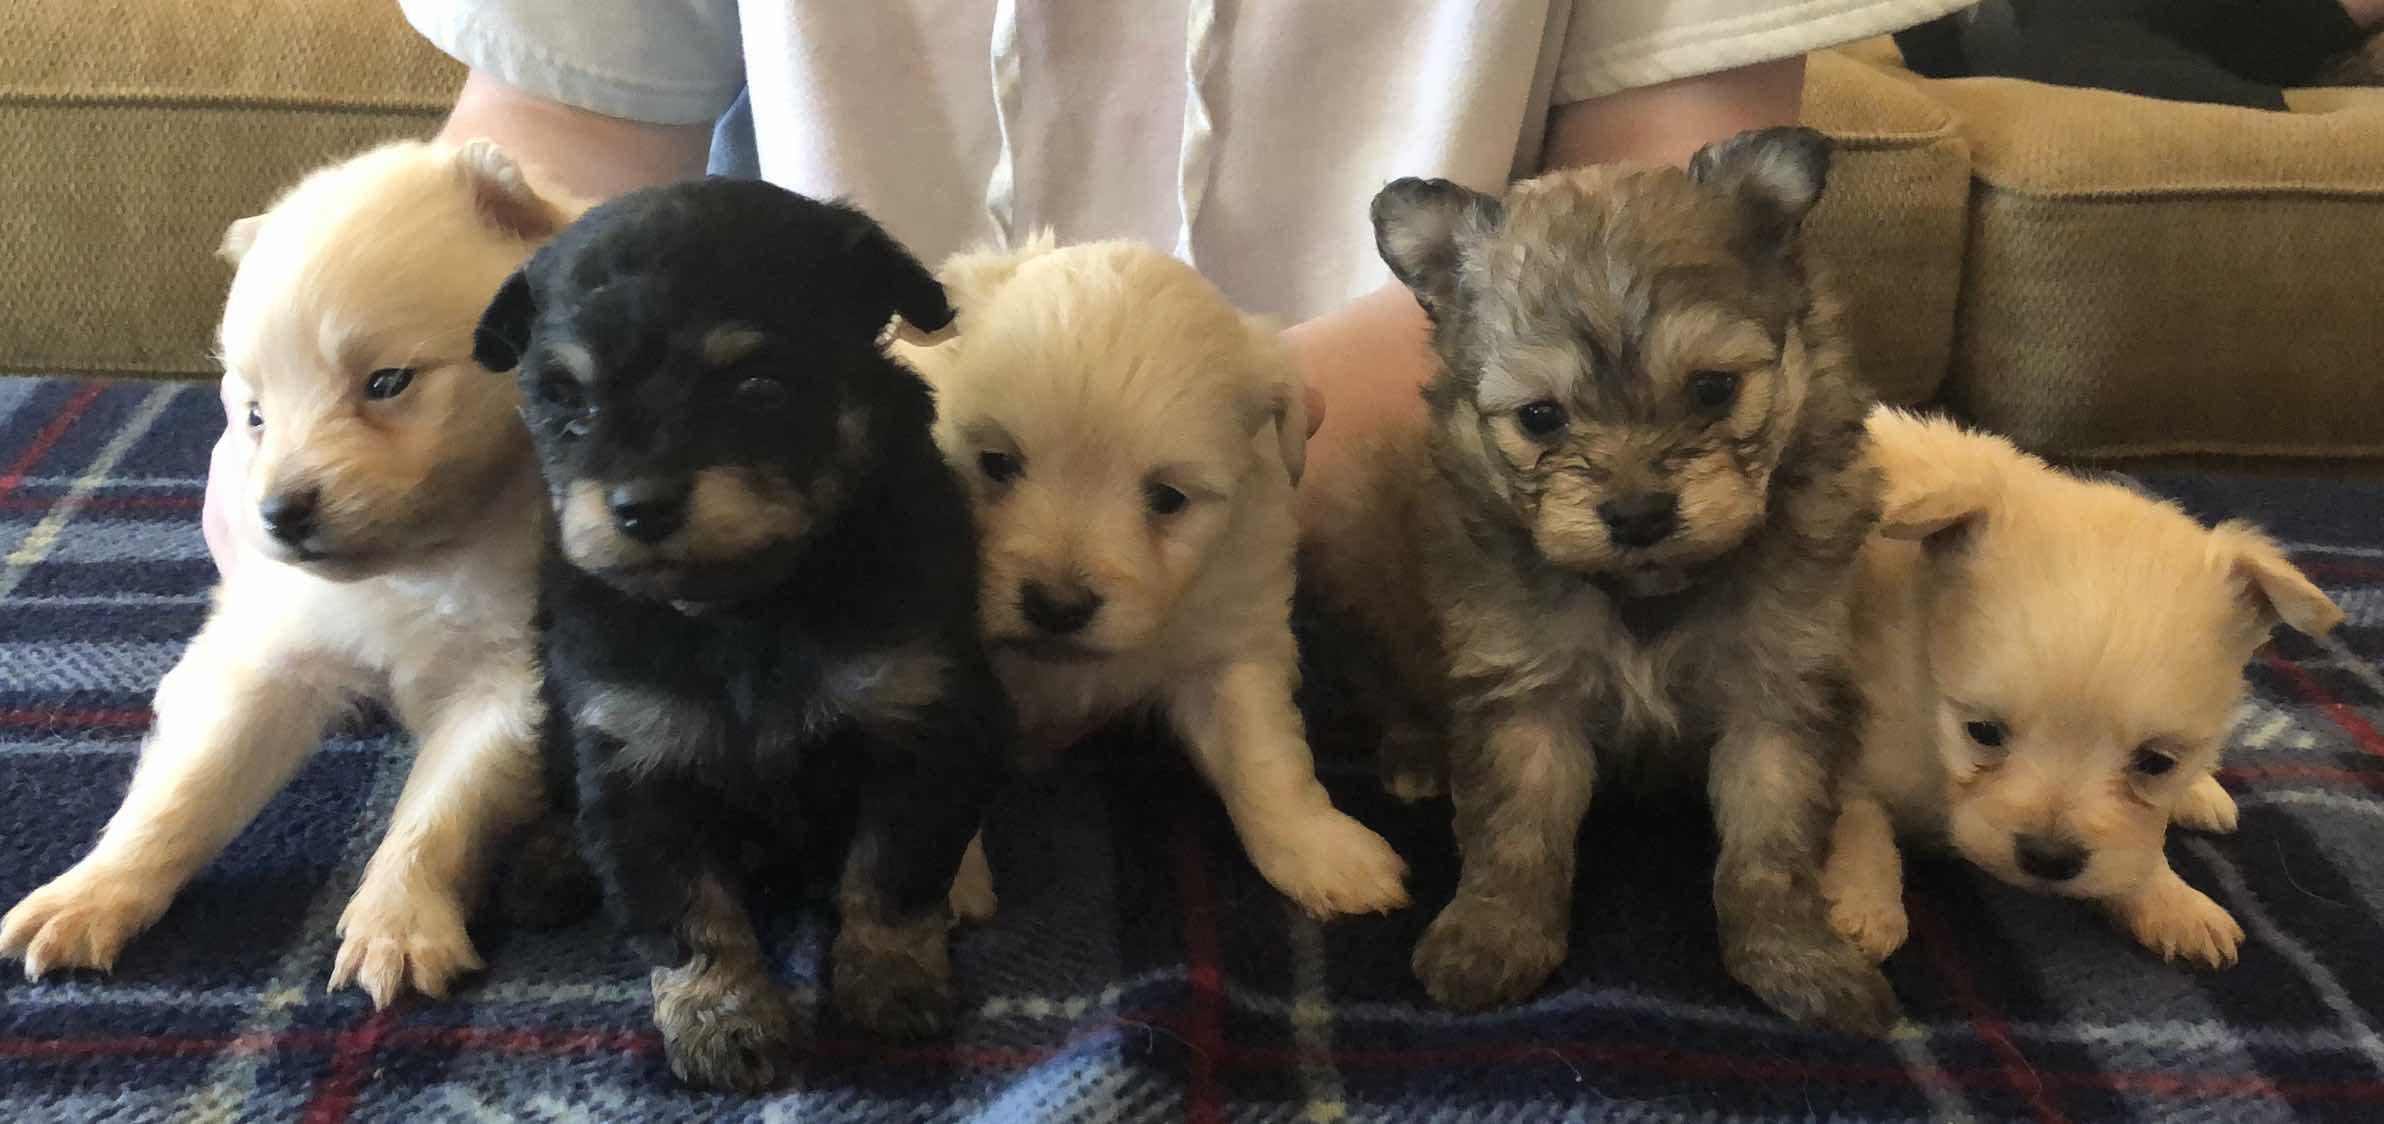 Daisys Dainty Dogs 2019-2861